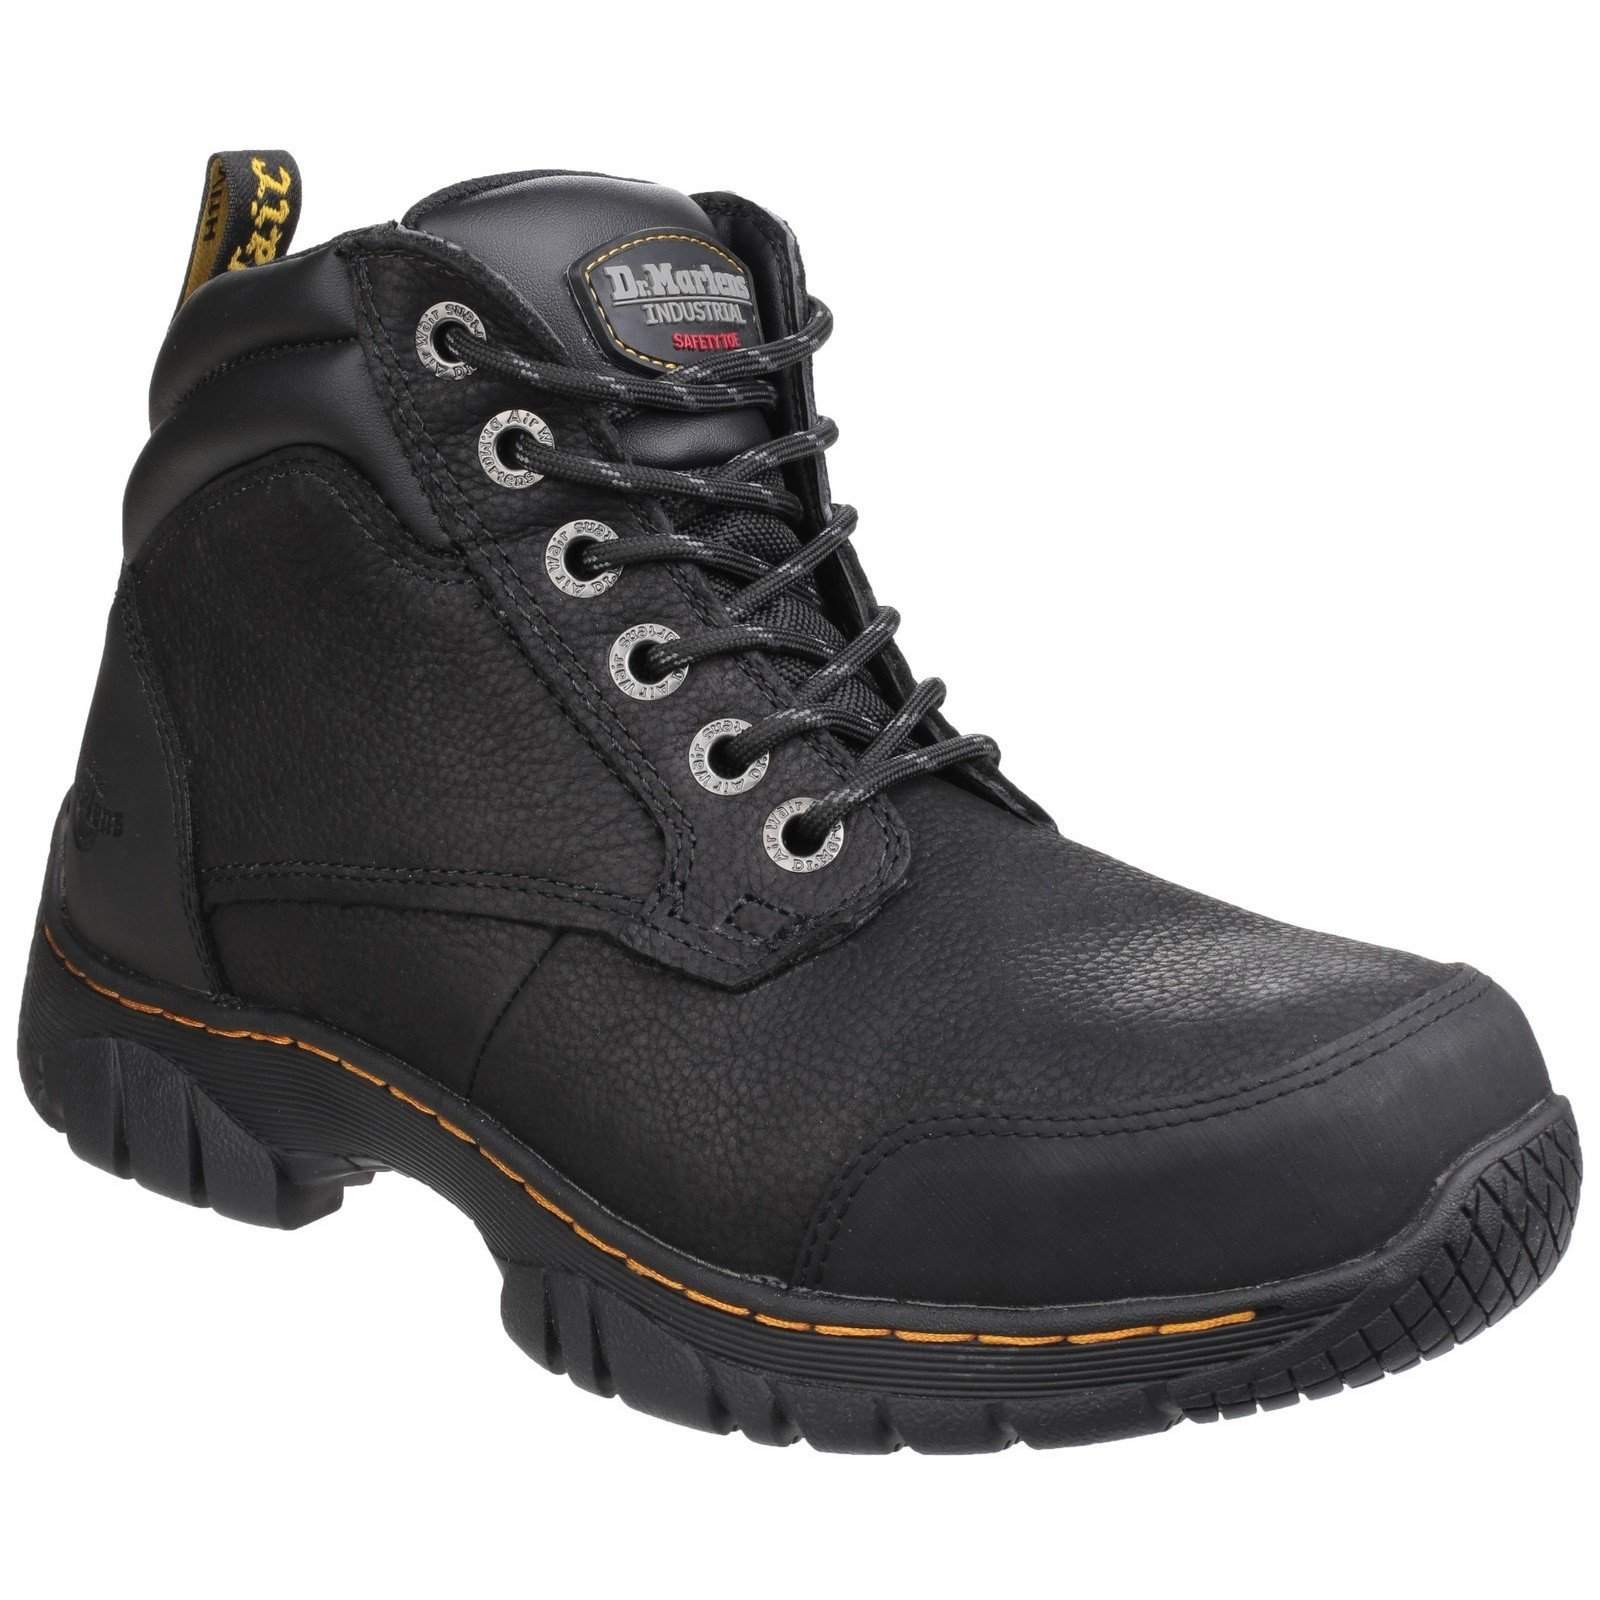 Dr Martens Unisex Riverton SB Lace up Hiker Boot Black 24533 - Black 13